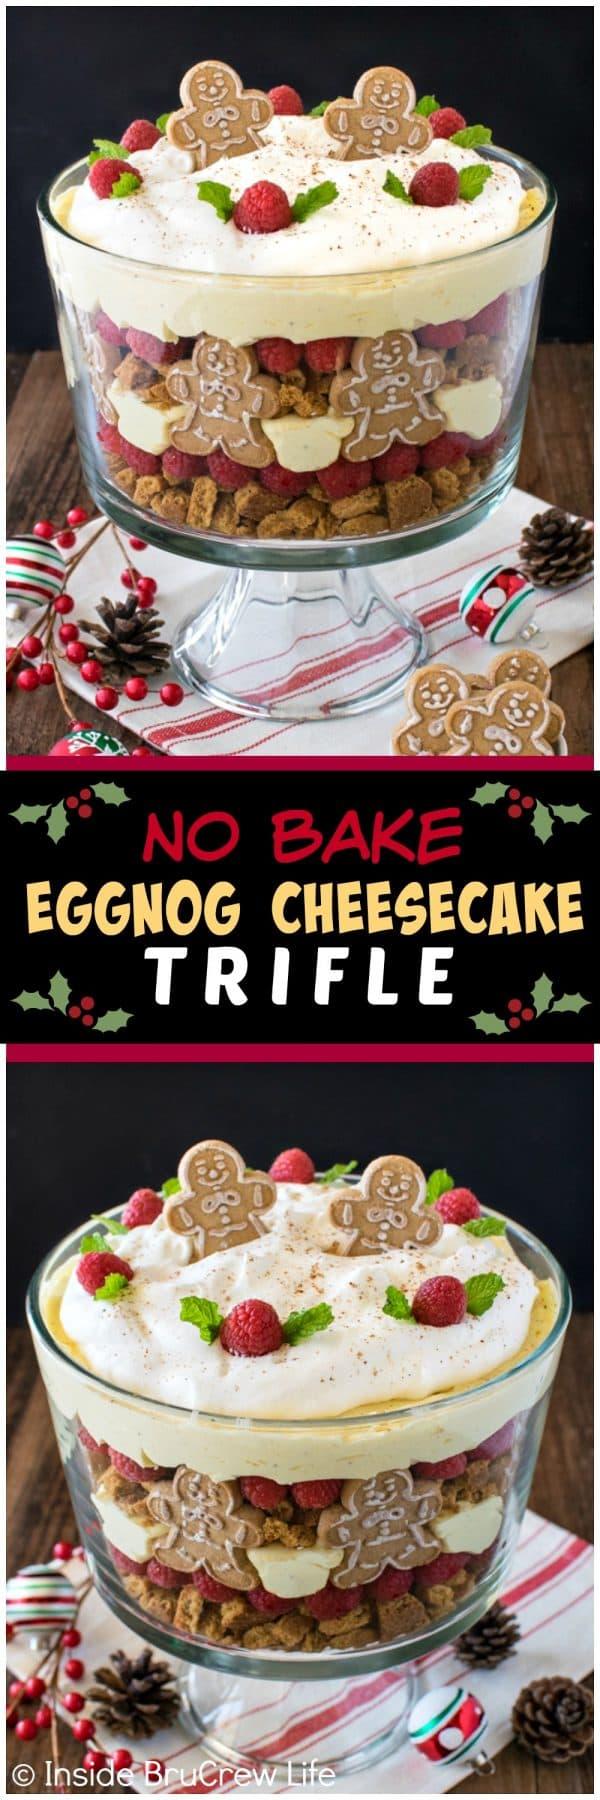 No Bake Eggnog Cheesecake Trifle Recipe